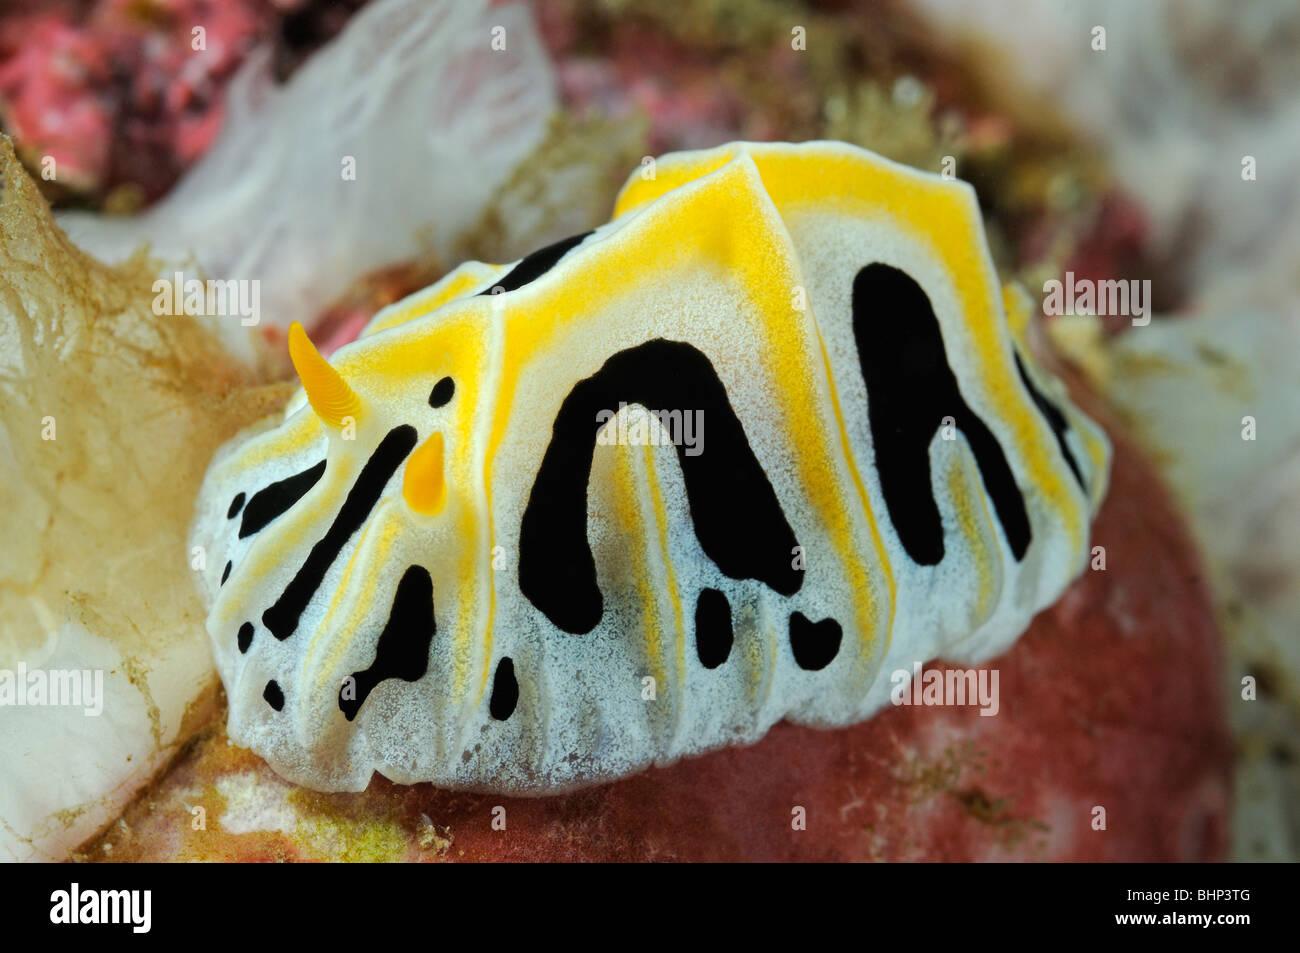 Reticulidia fungia, yellow black white nudibranch, Pemuteran, Bali, Indonesia, Indo-Pacific Ocean - Stock Image